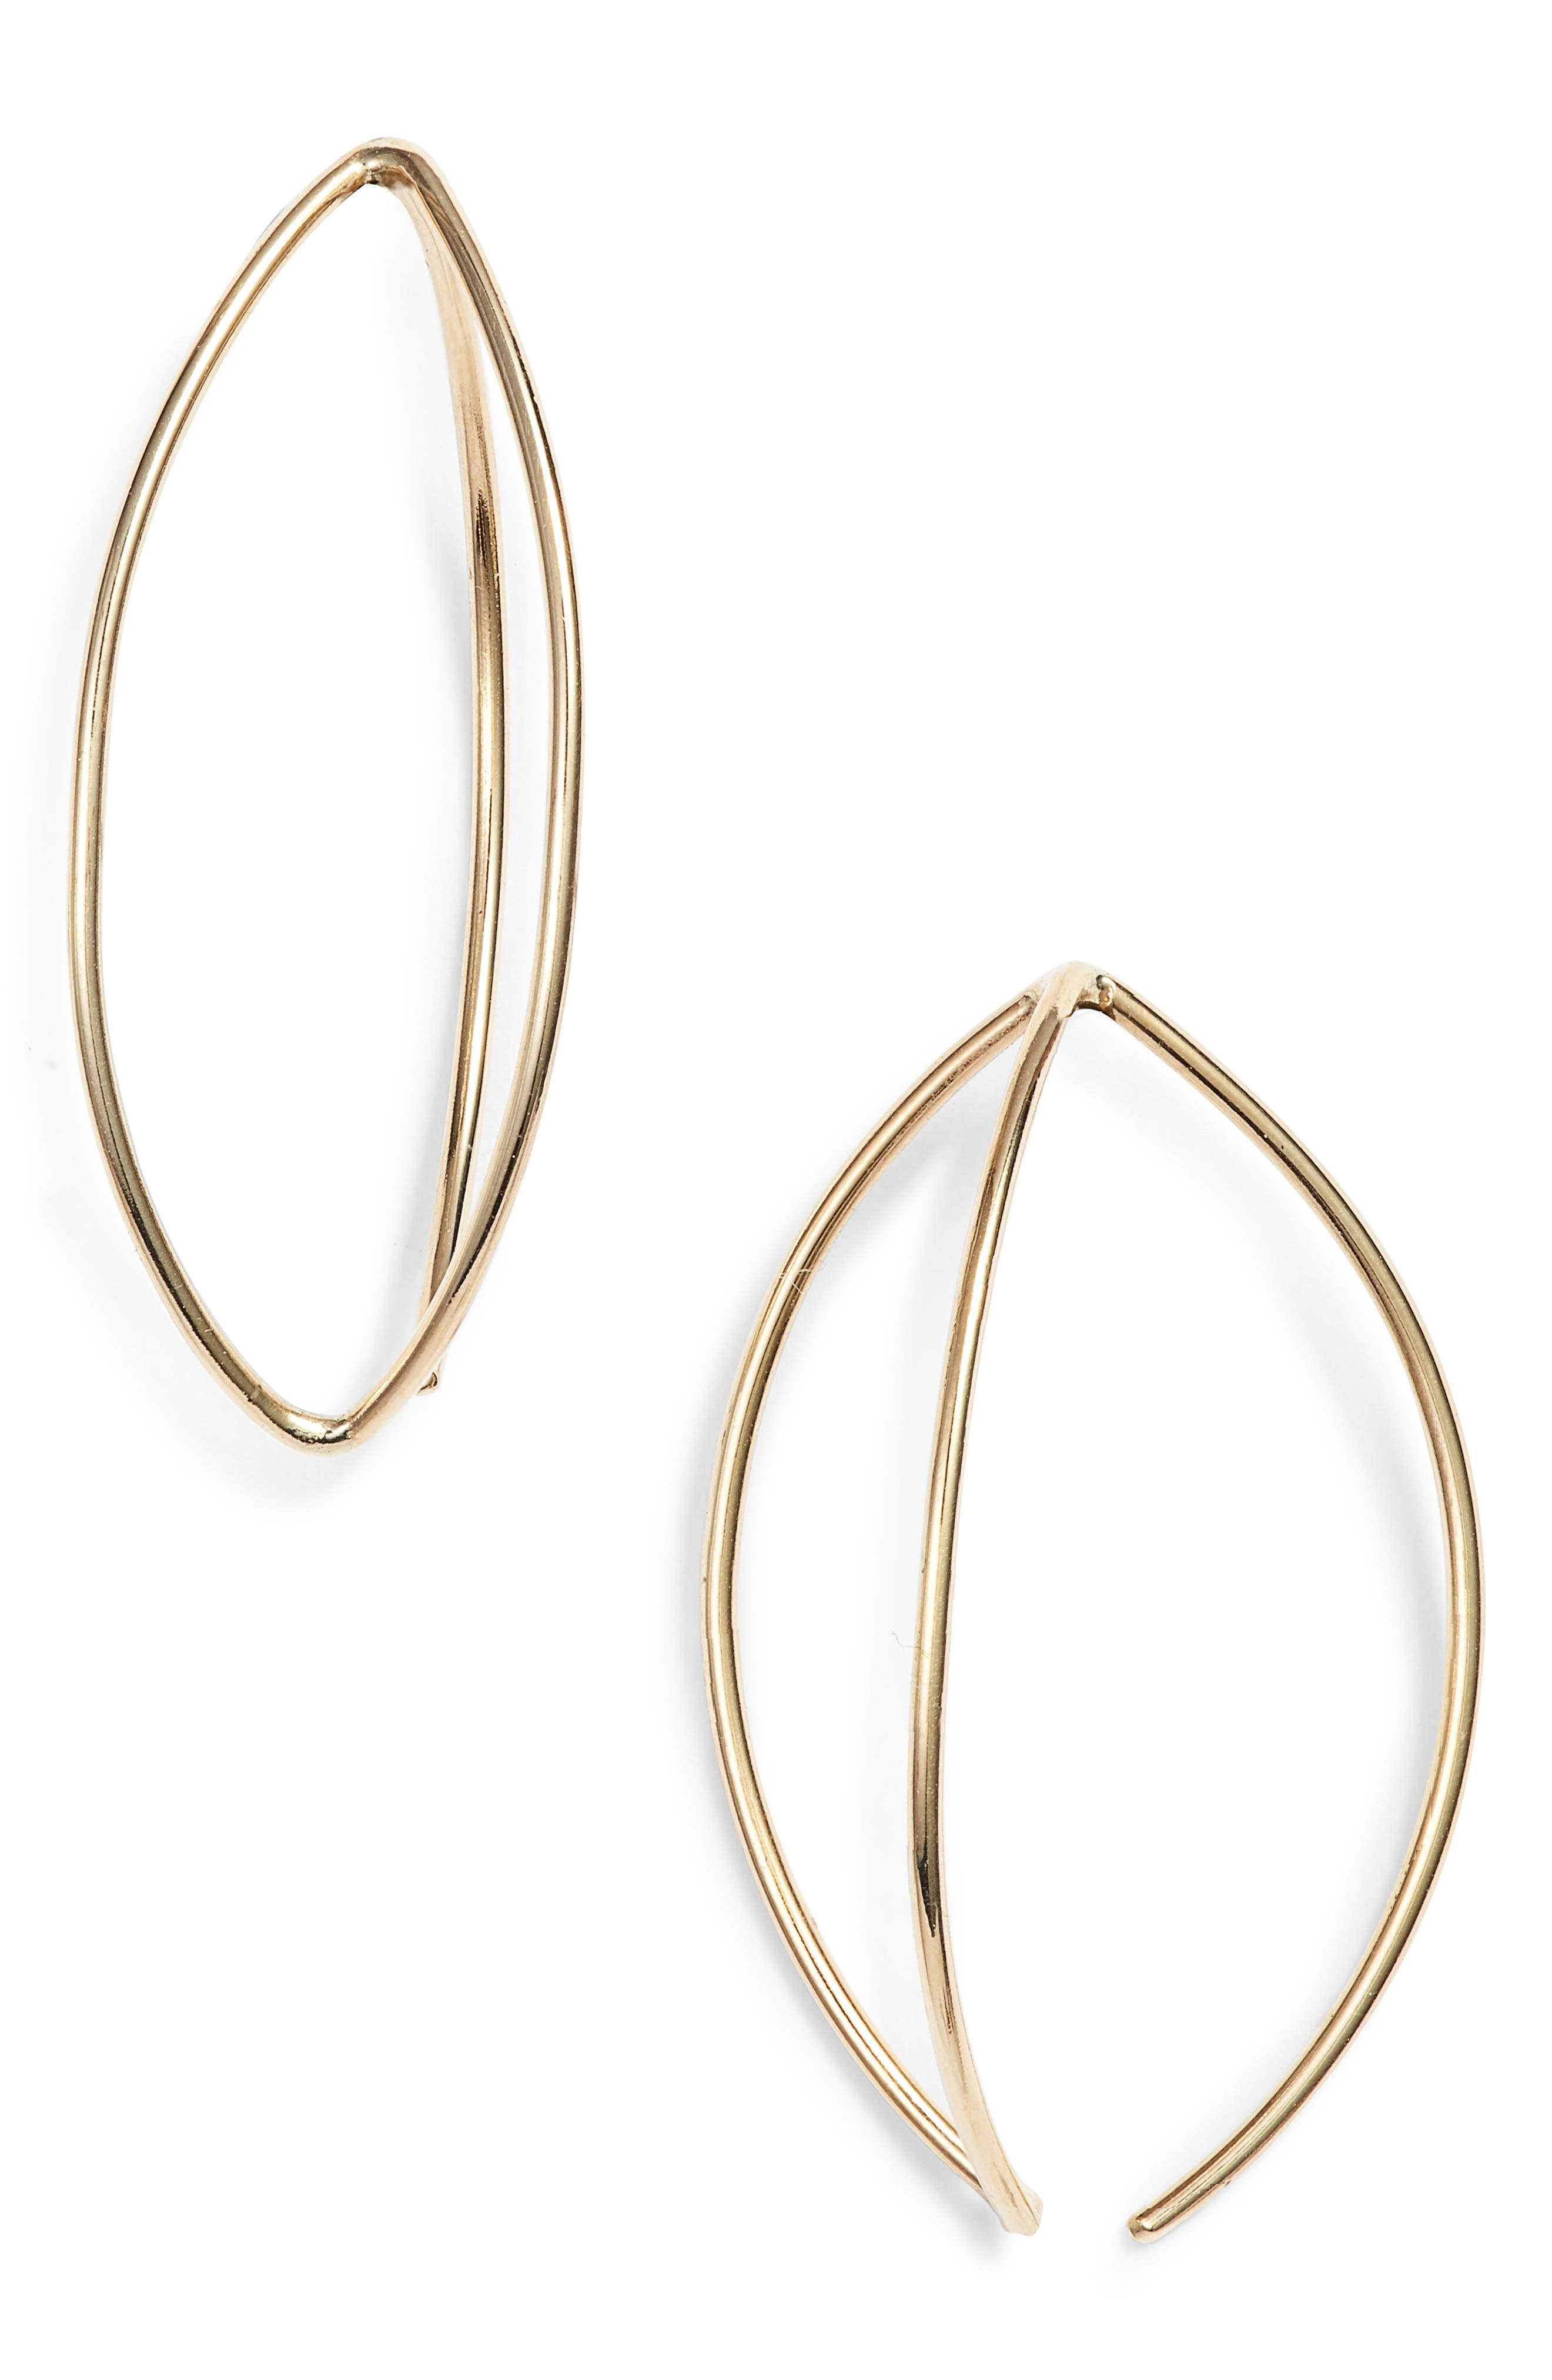 Oval Earrings,                             Main thumbnail 1, color,                             GOLD